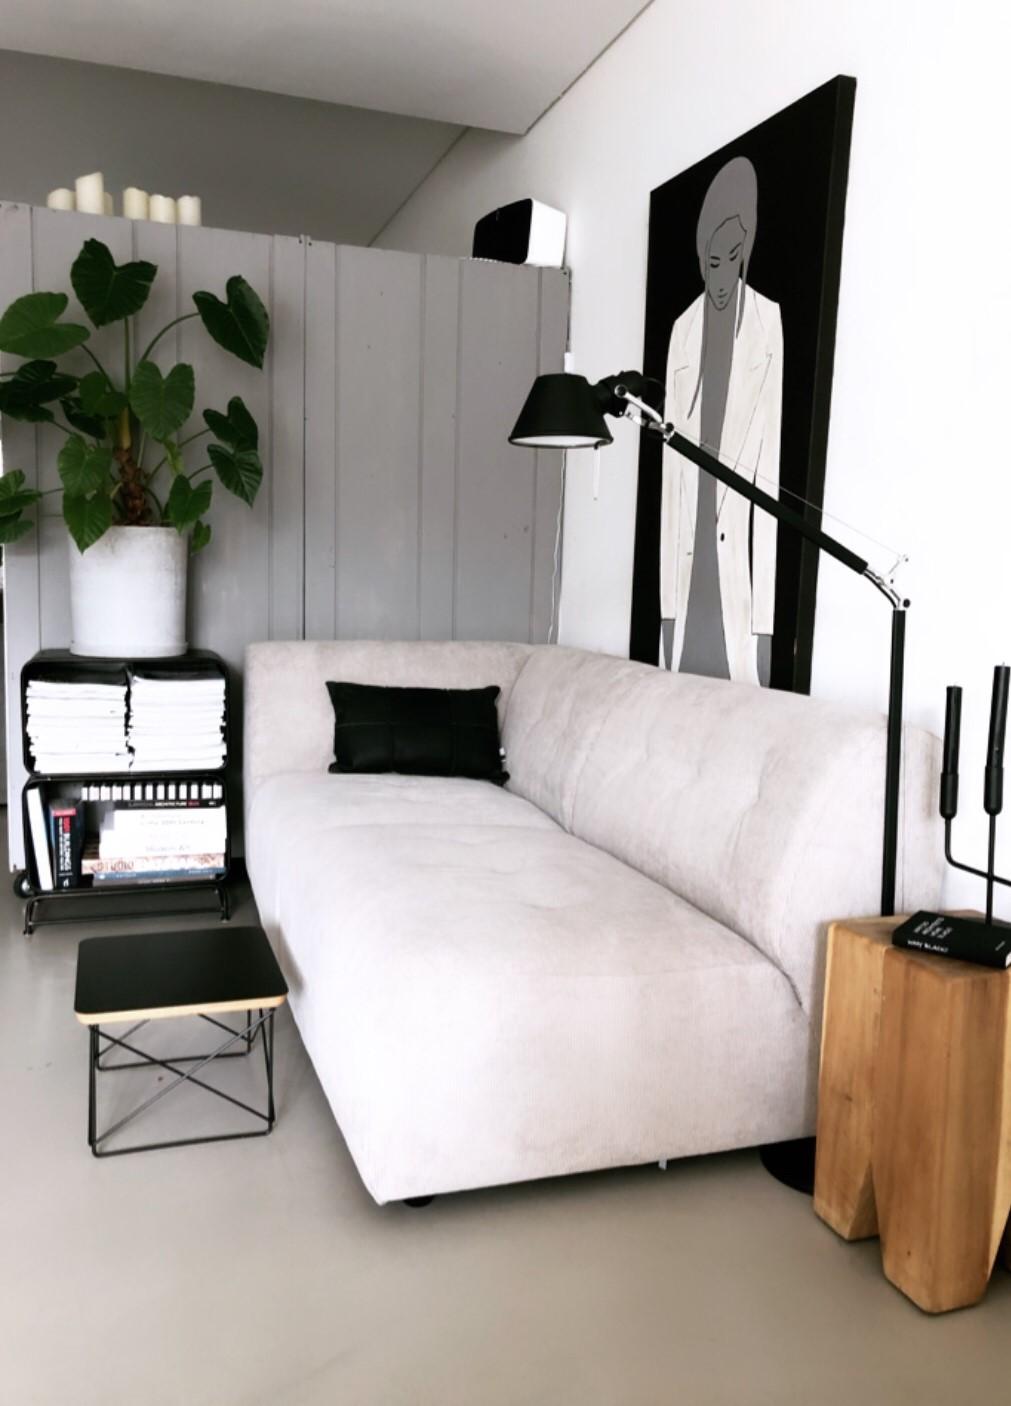 Studio M. Interieurontwerp & Styling